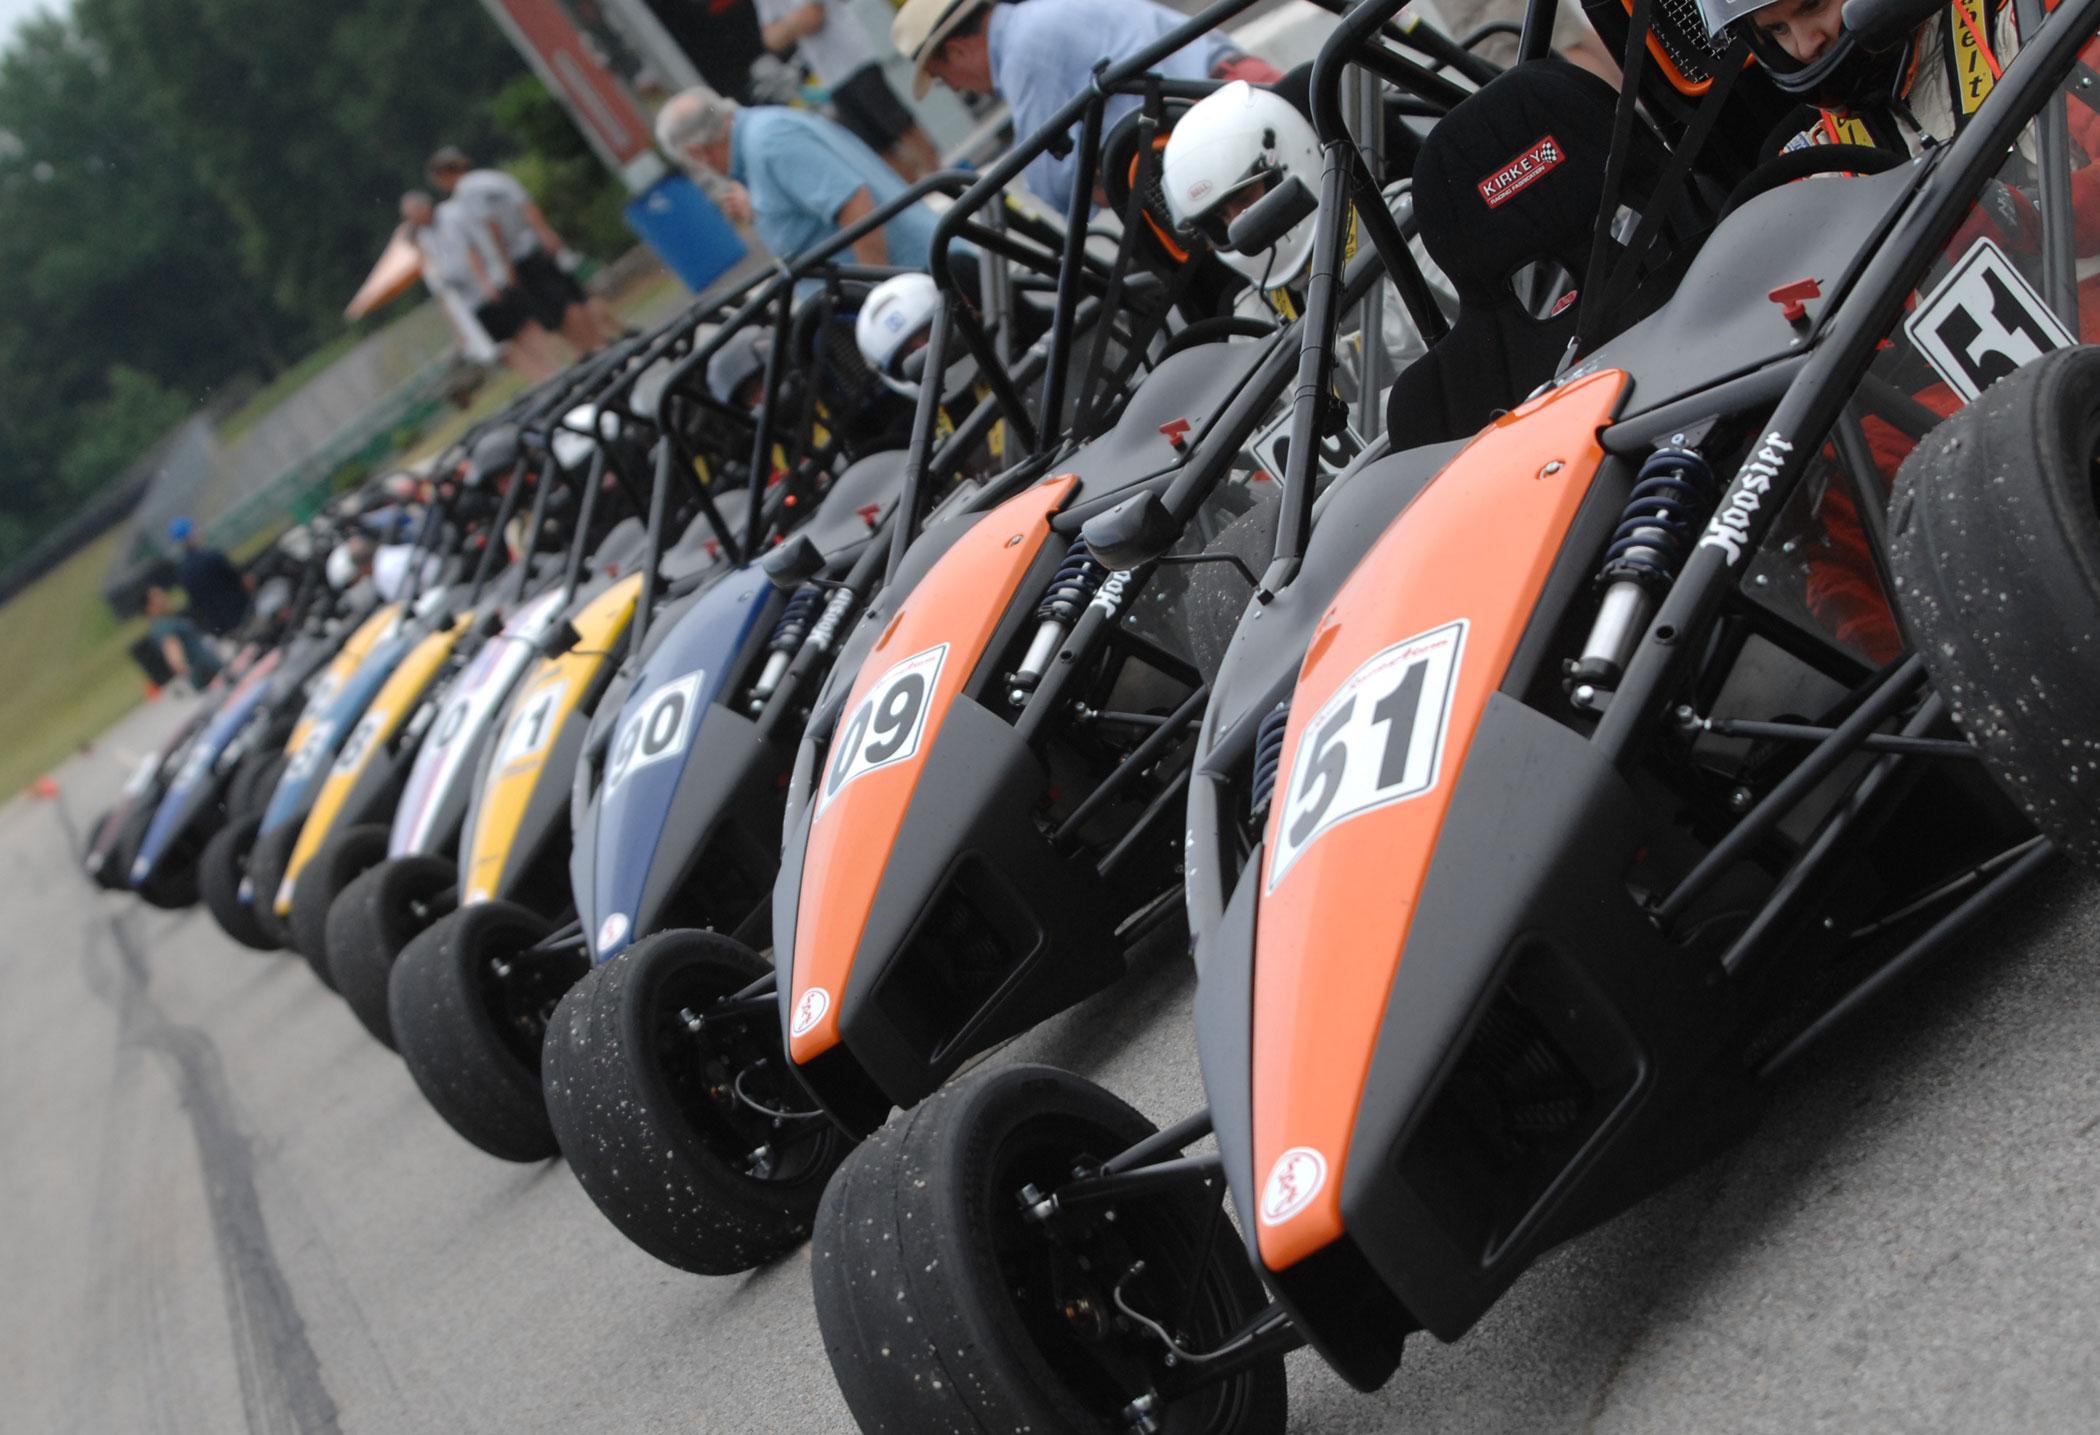 ariel atom, ariel atom race cars